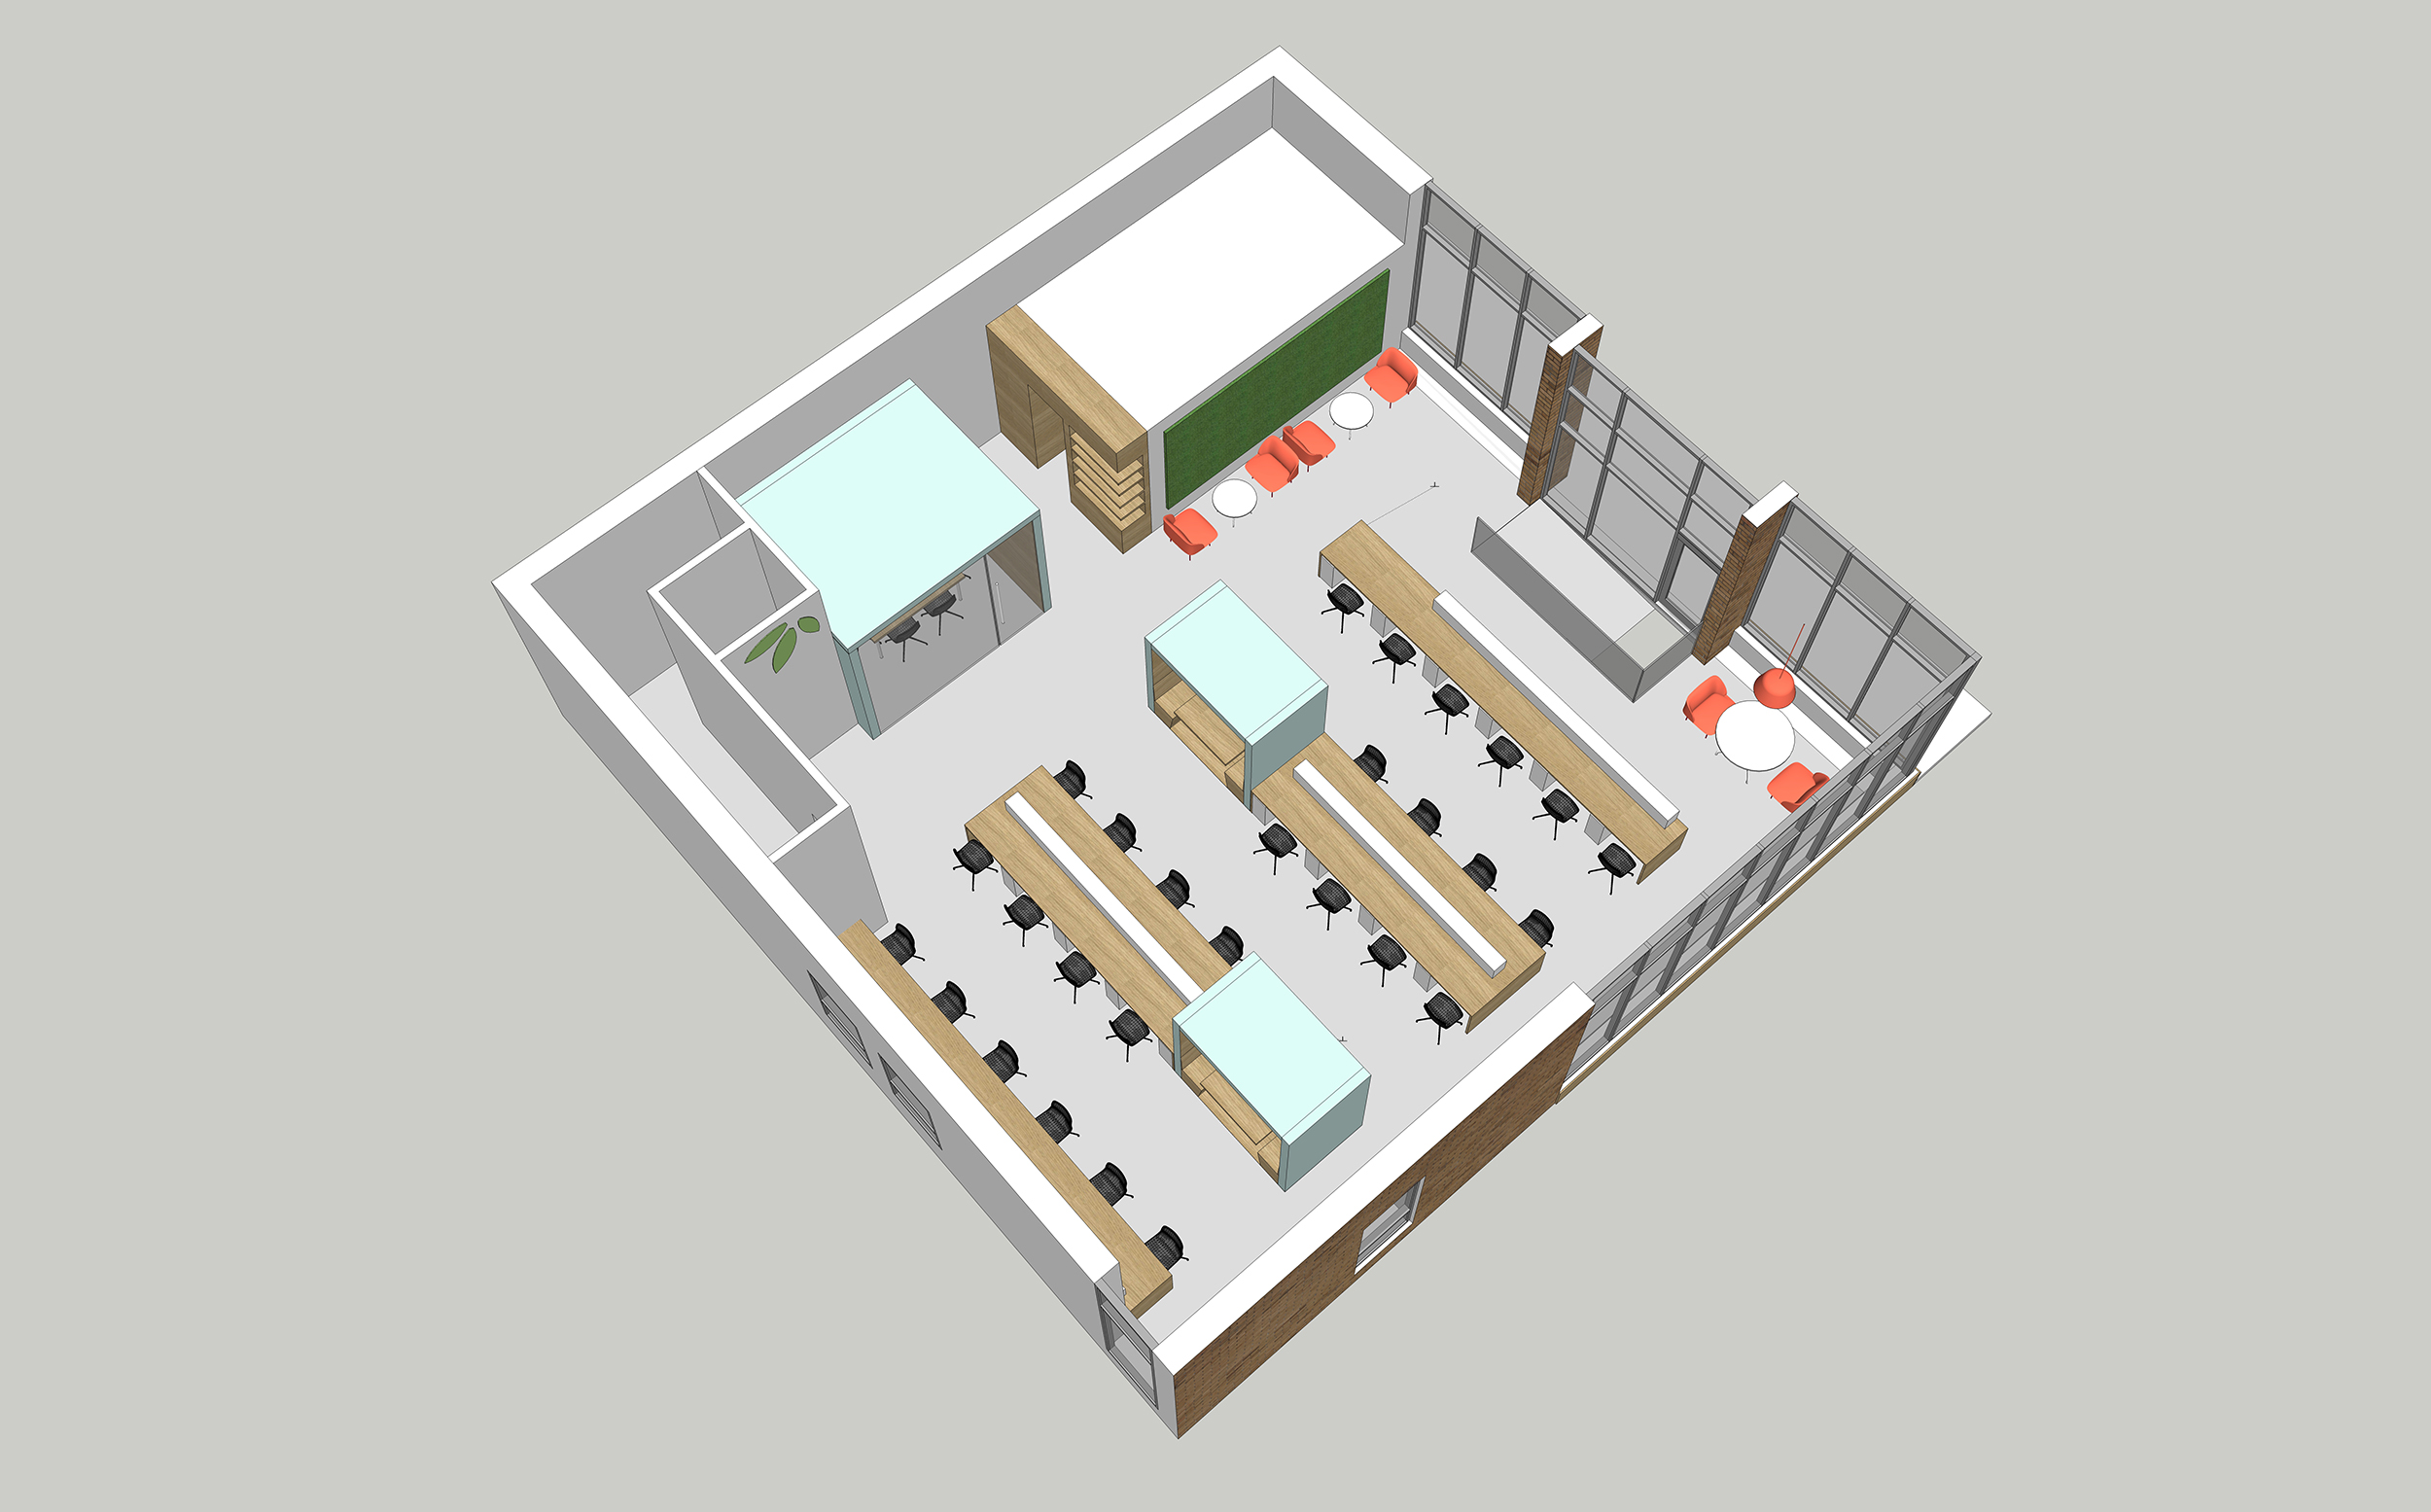 office_layout_axo_b.jpg